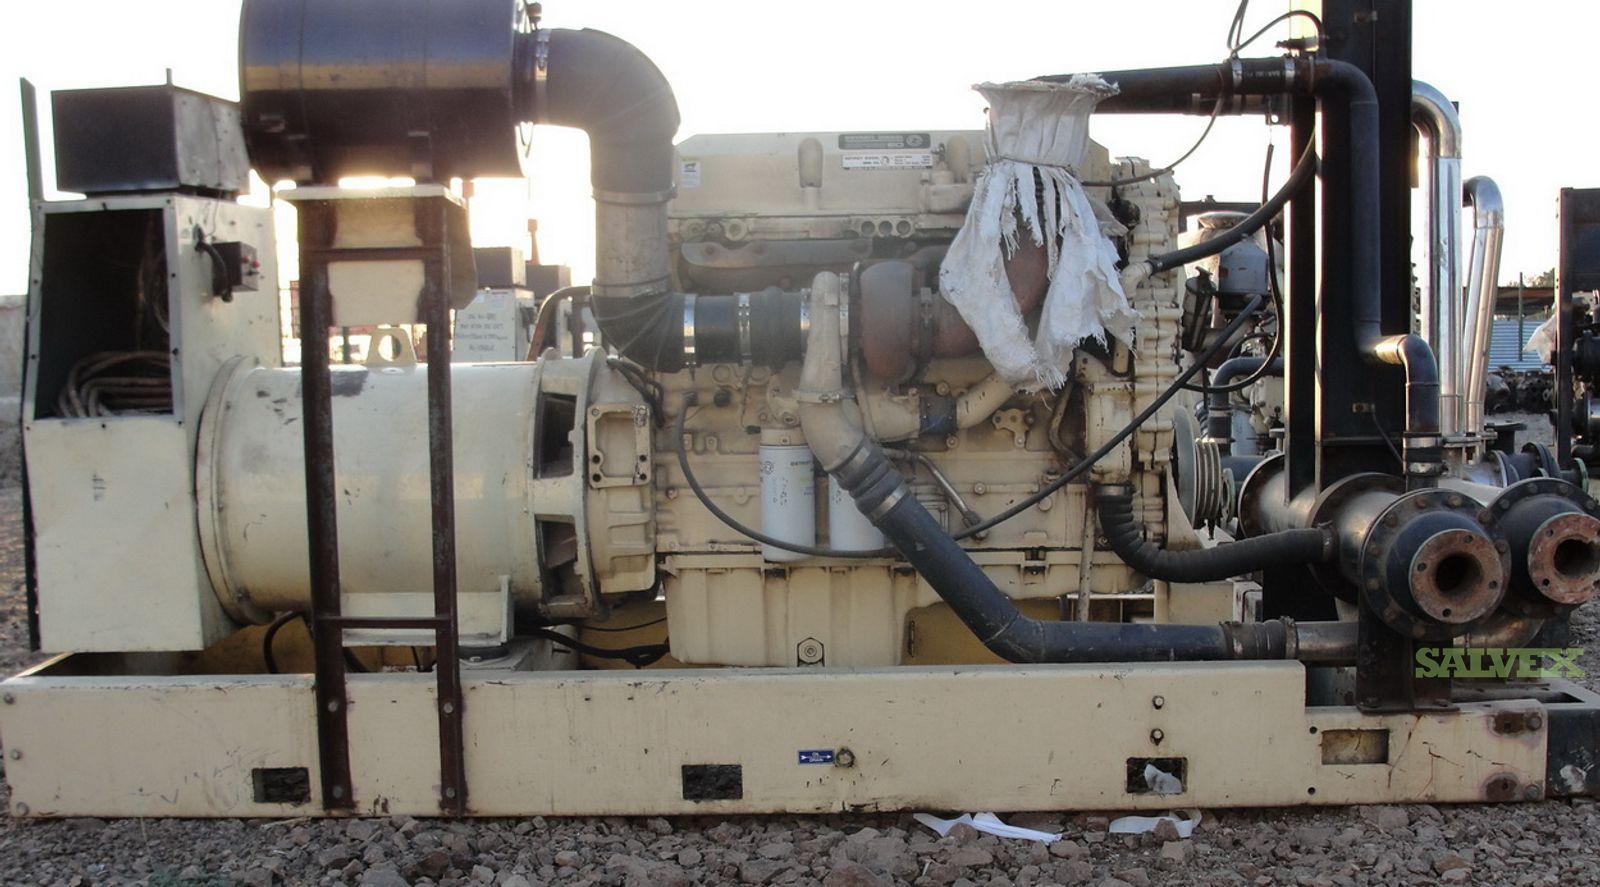 7 X Kohler 360P5 360 kva Detroit Series 60 Generator set for sale.